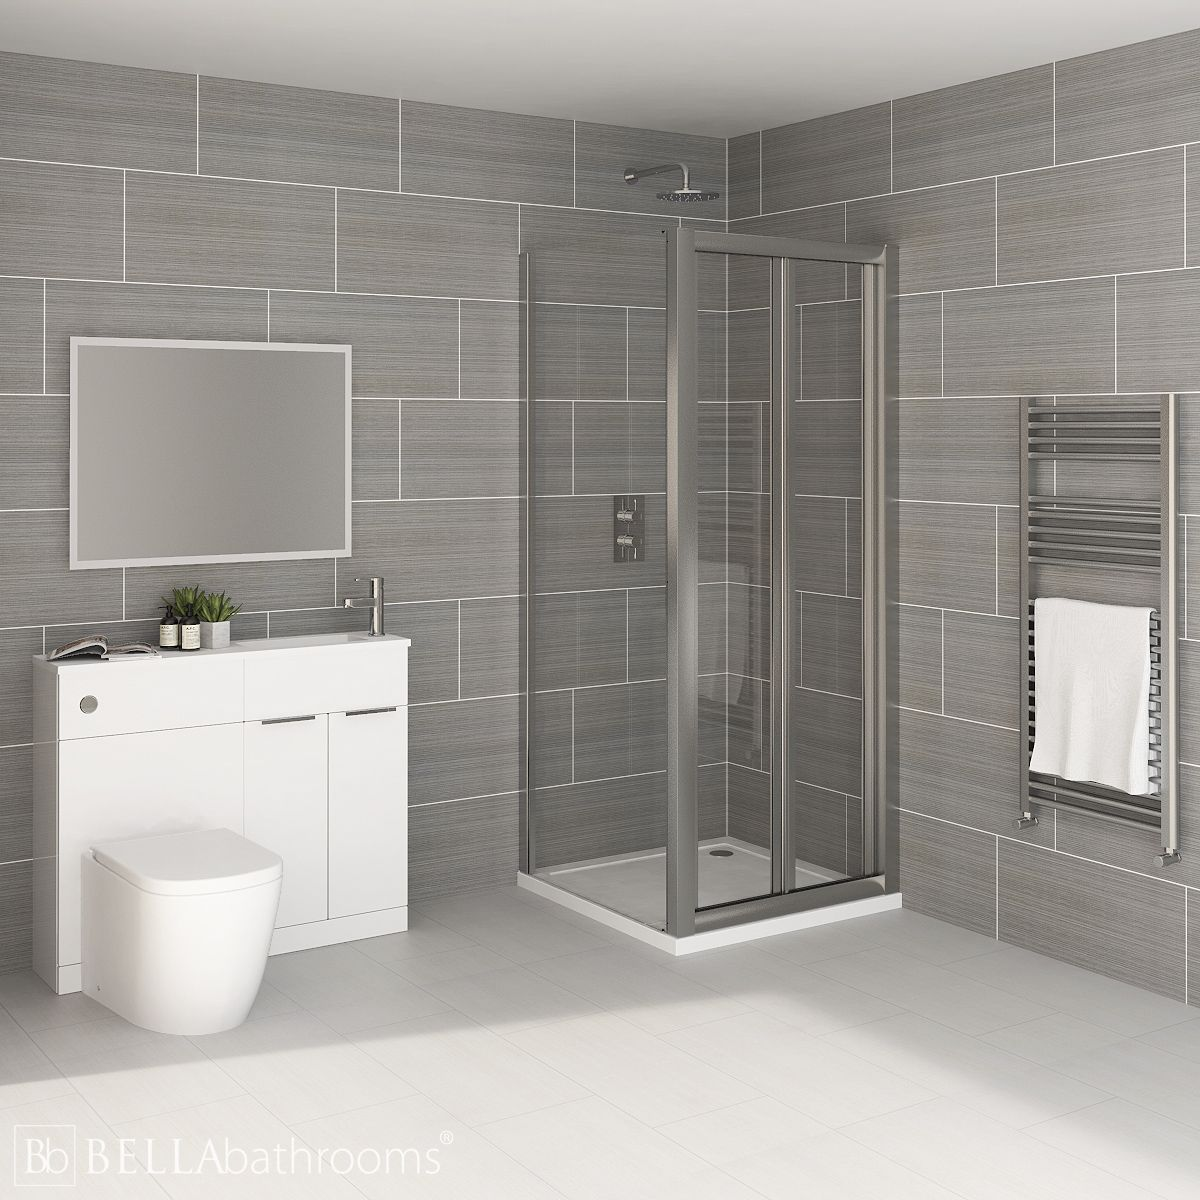 Elation Combination White Furniture Suite with April Destini Bi Fold Shower Enclosure with Cayton Toilet